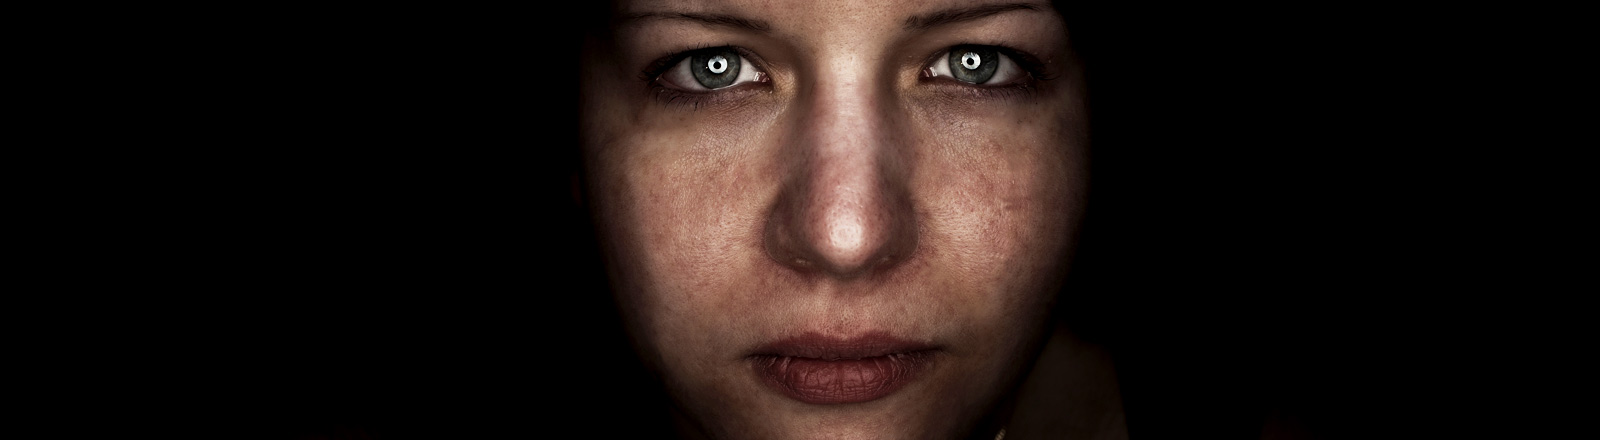 Eine Frau mit traurigem, starkem Blick